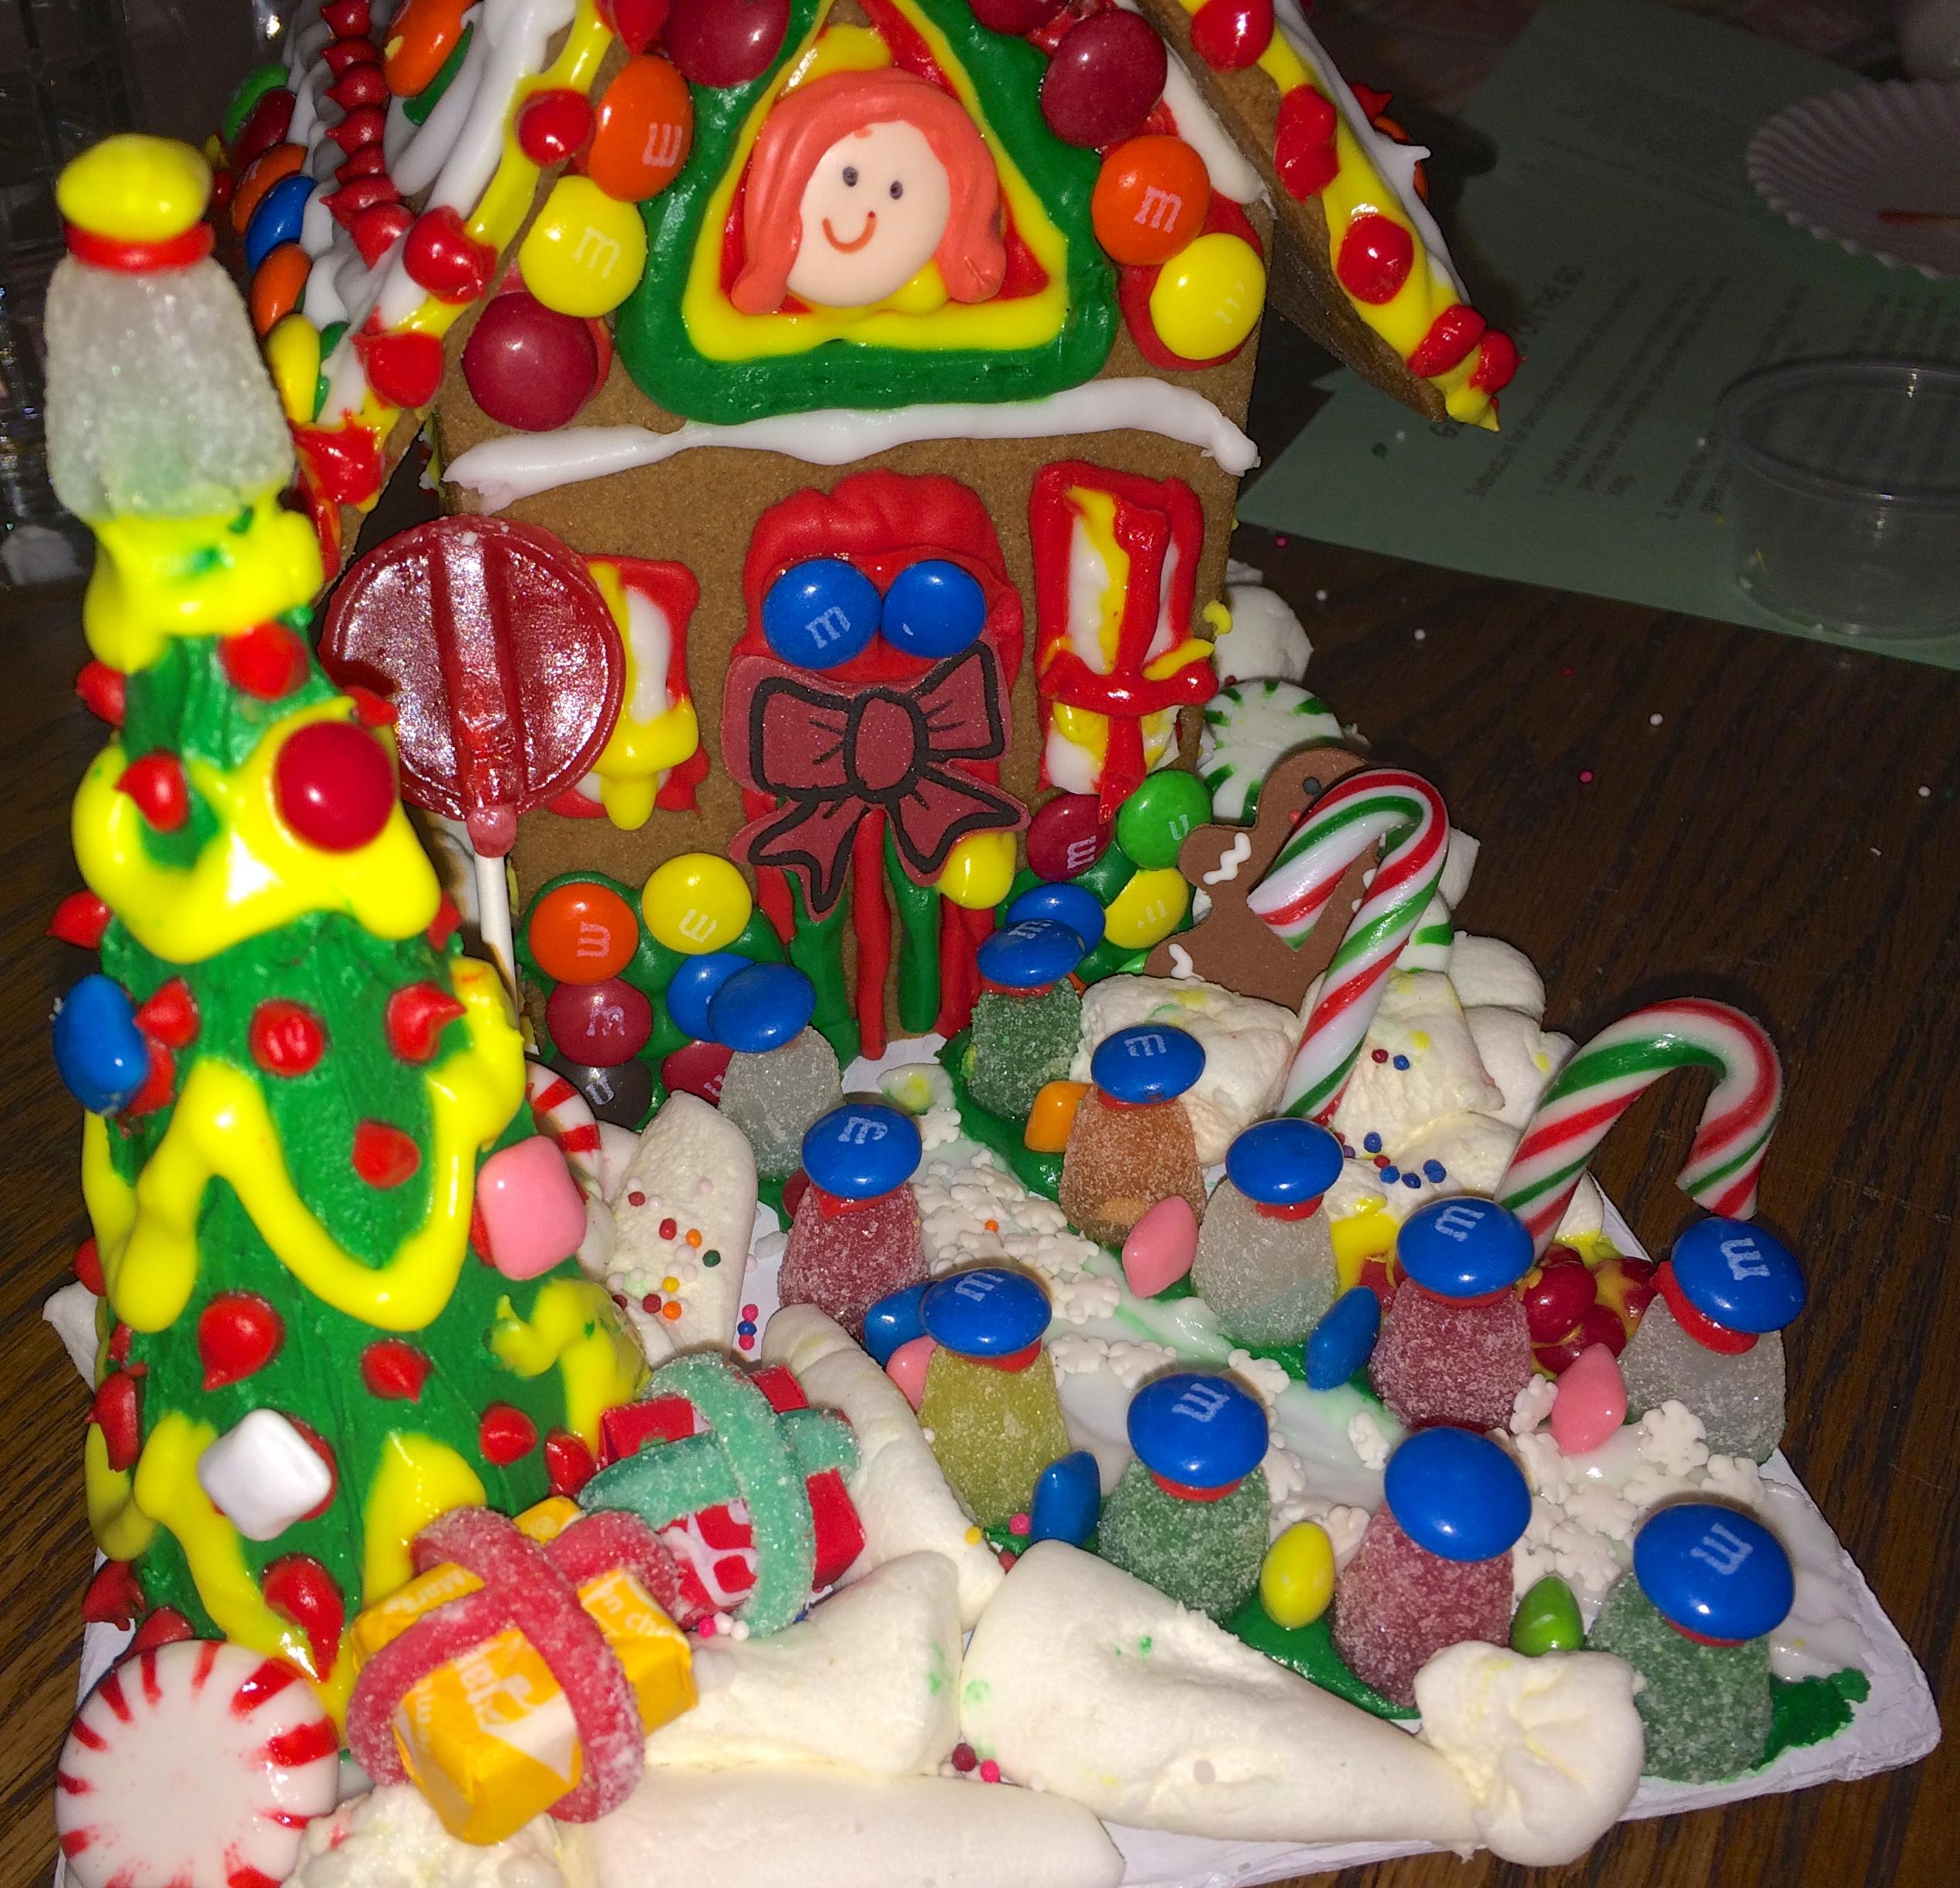 Divine Kids Gingerbread House Ideas Pinterest Gingerbread House Ideas Gingerbread House Making Ideas Gingerbread House Making Ideas School ideas Gingerbread House Ideas